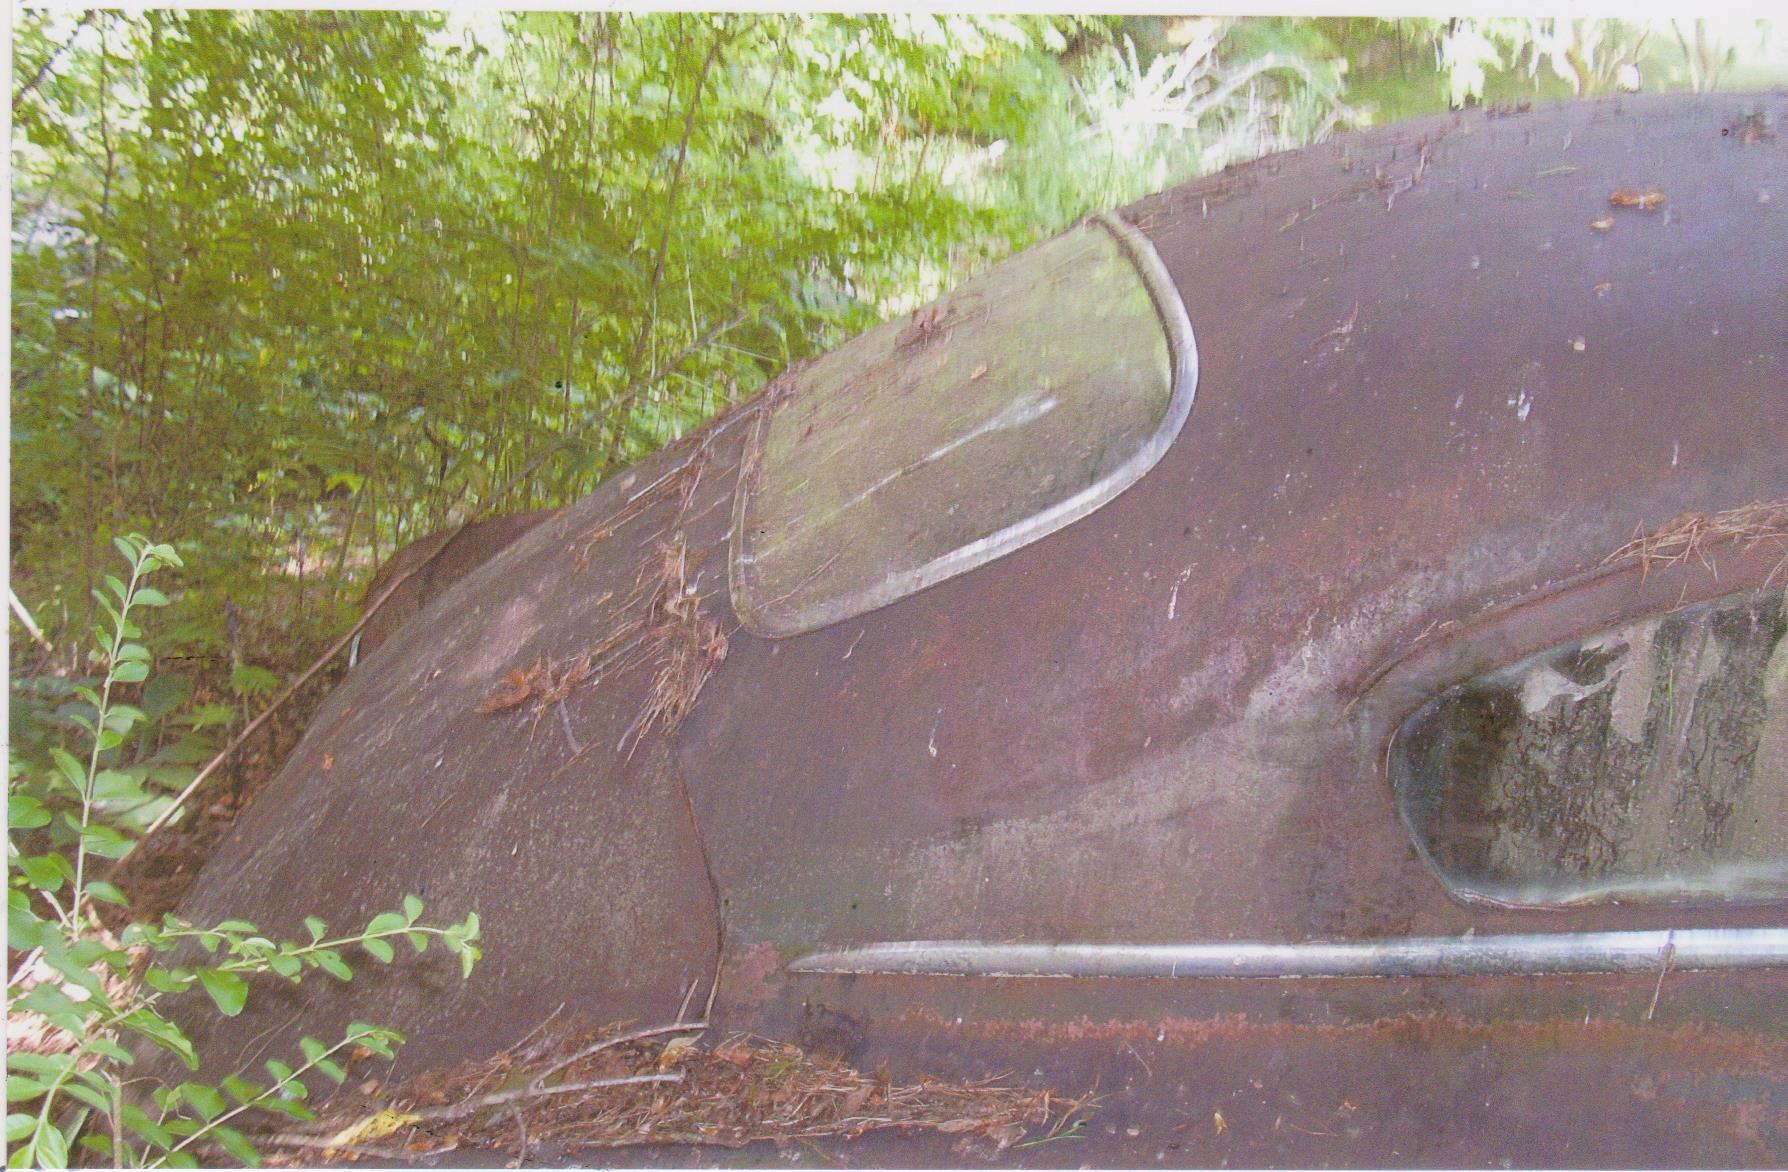 Click image for larger version  Name:Pontiac Silver Streak 003.jpg Views:72 Size:350.6 KB ID:75816